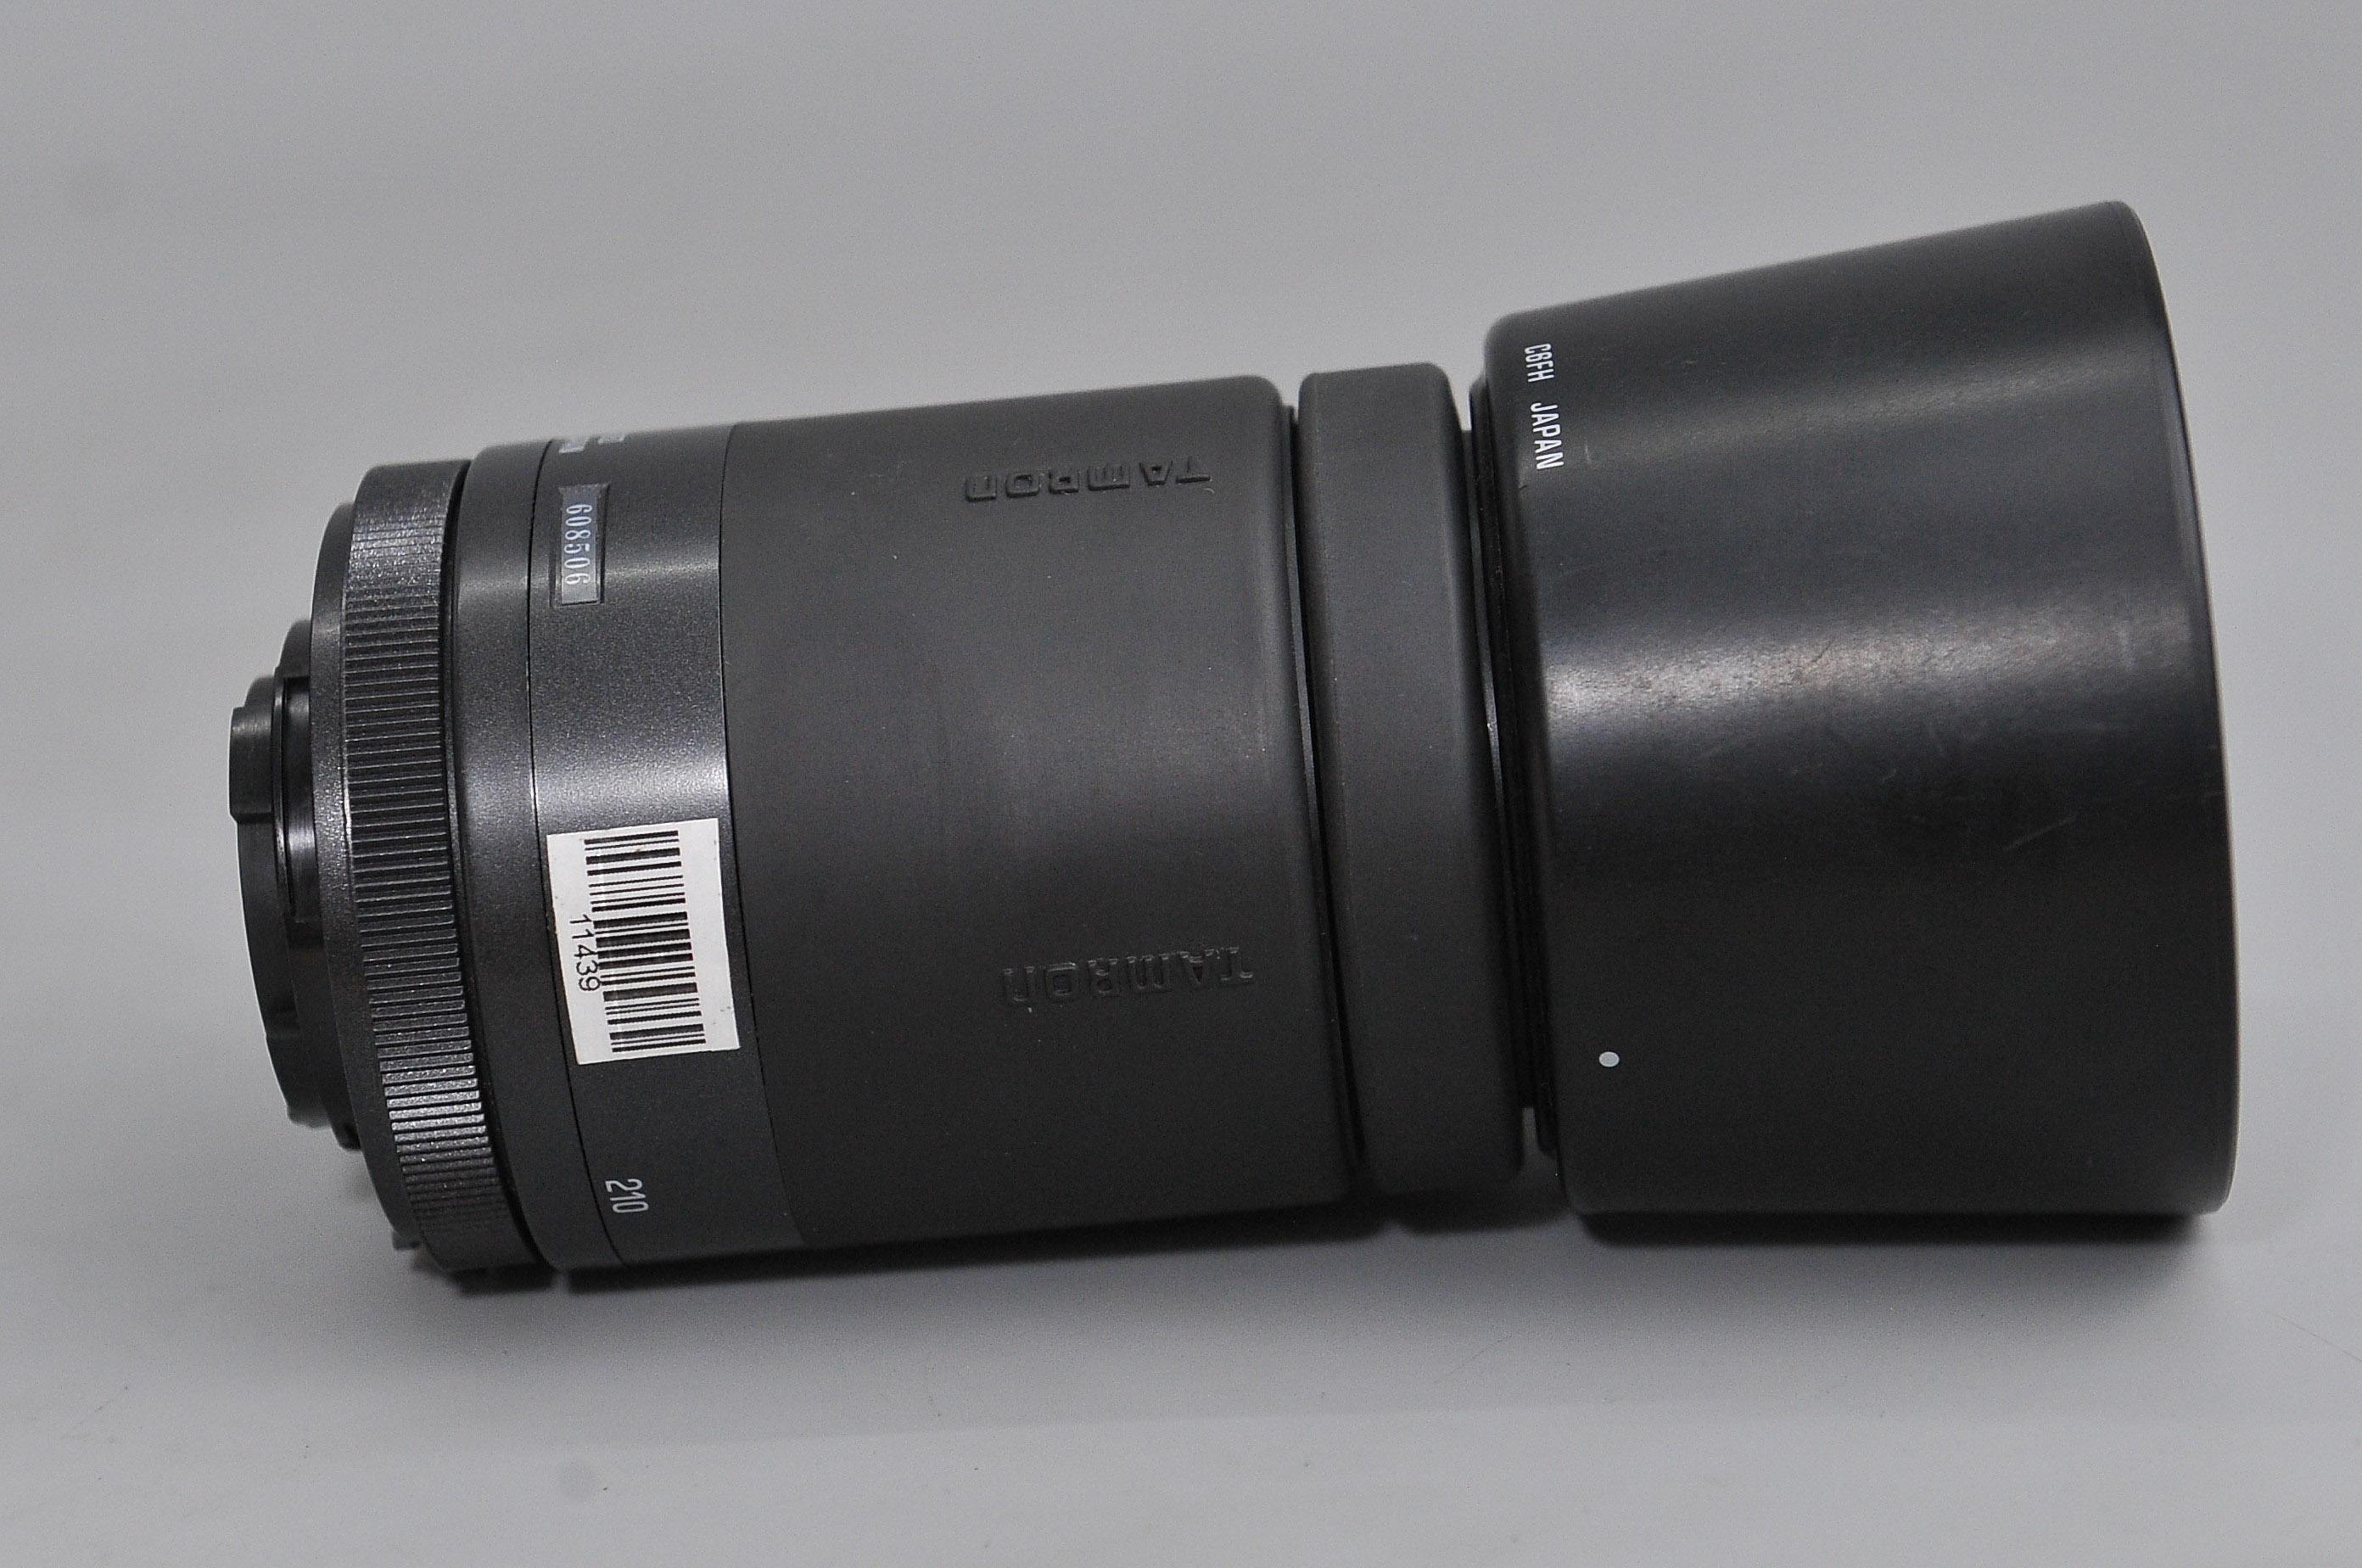 tamron-80-210mm-f4-5-5-6-af-nikon-80-210-4-5-5-6-11439